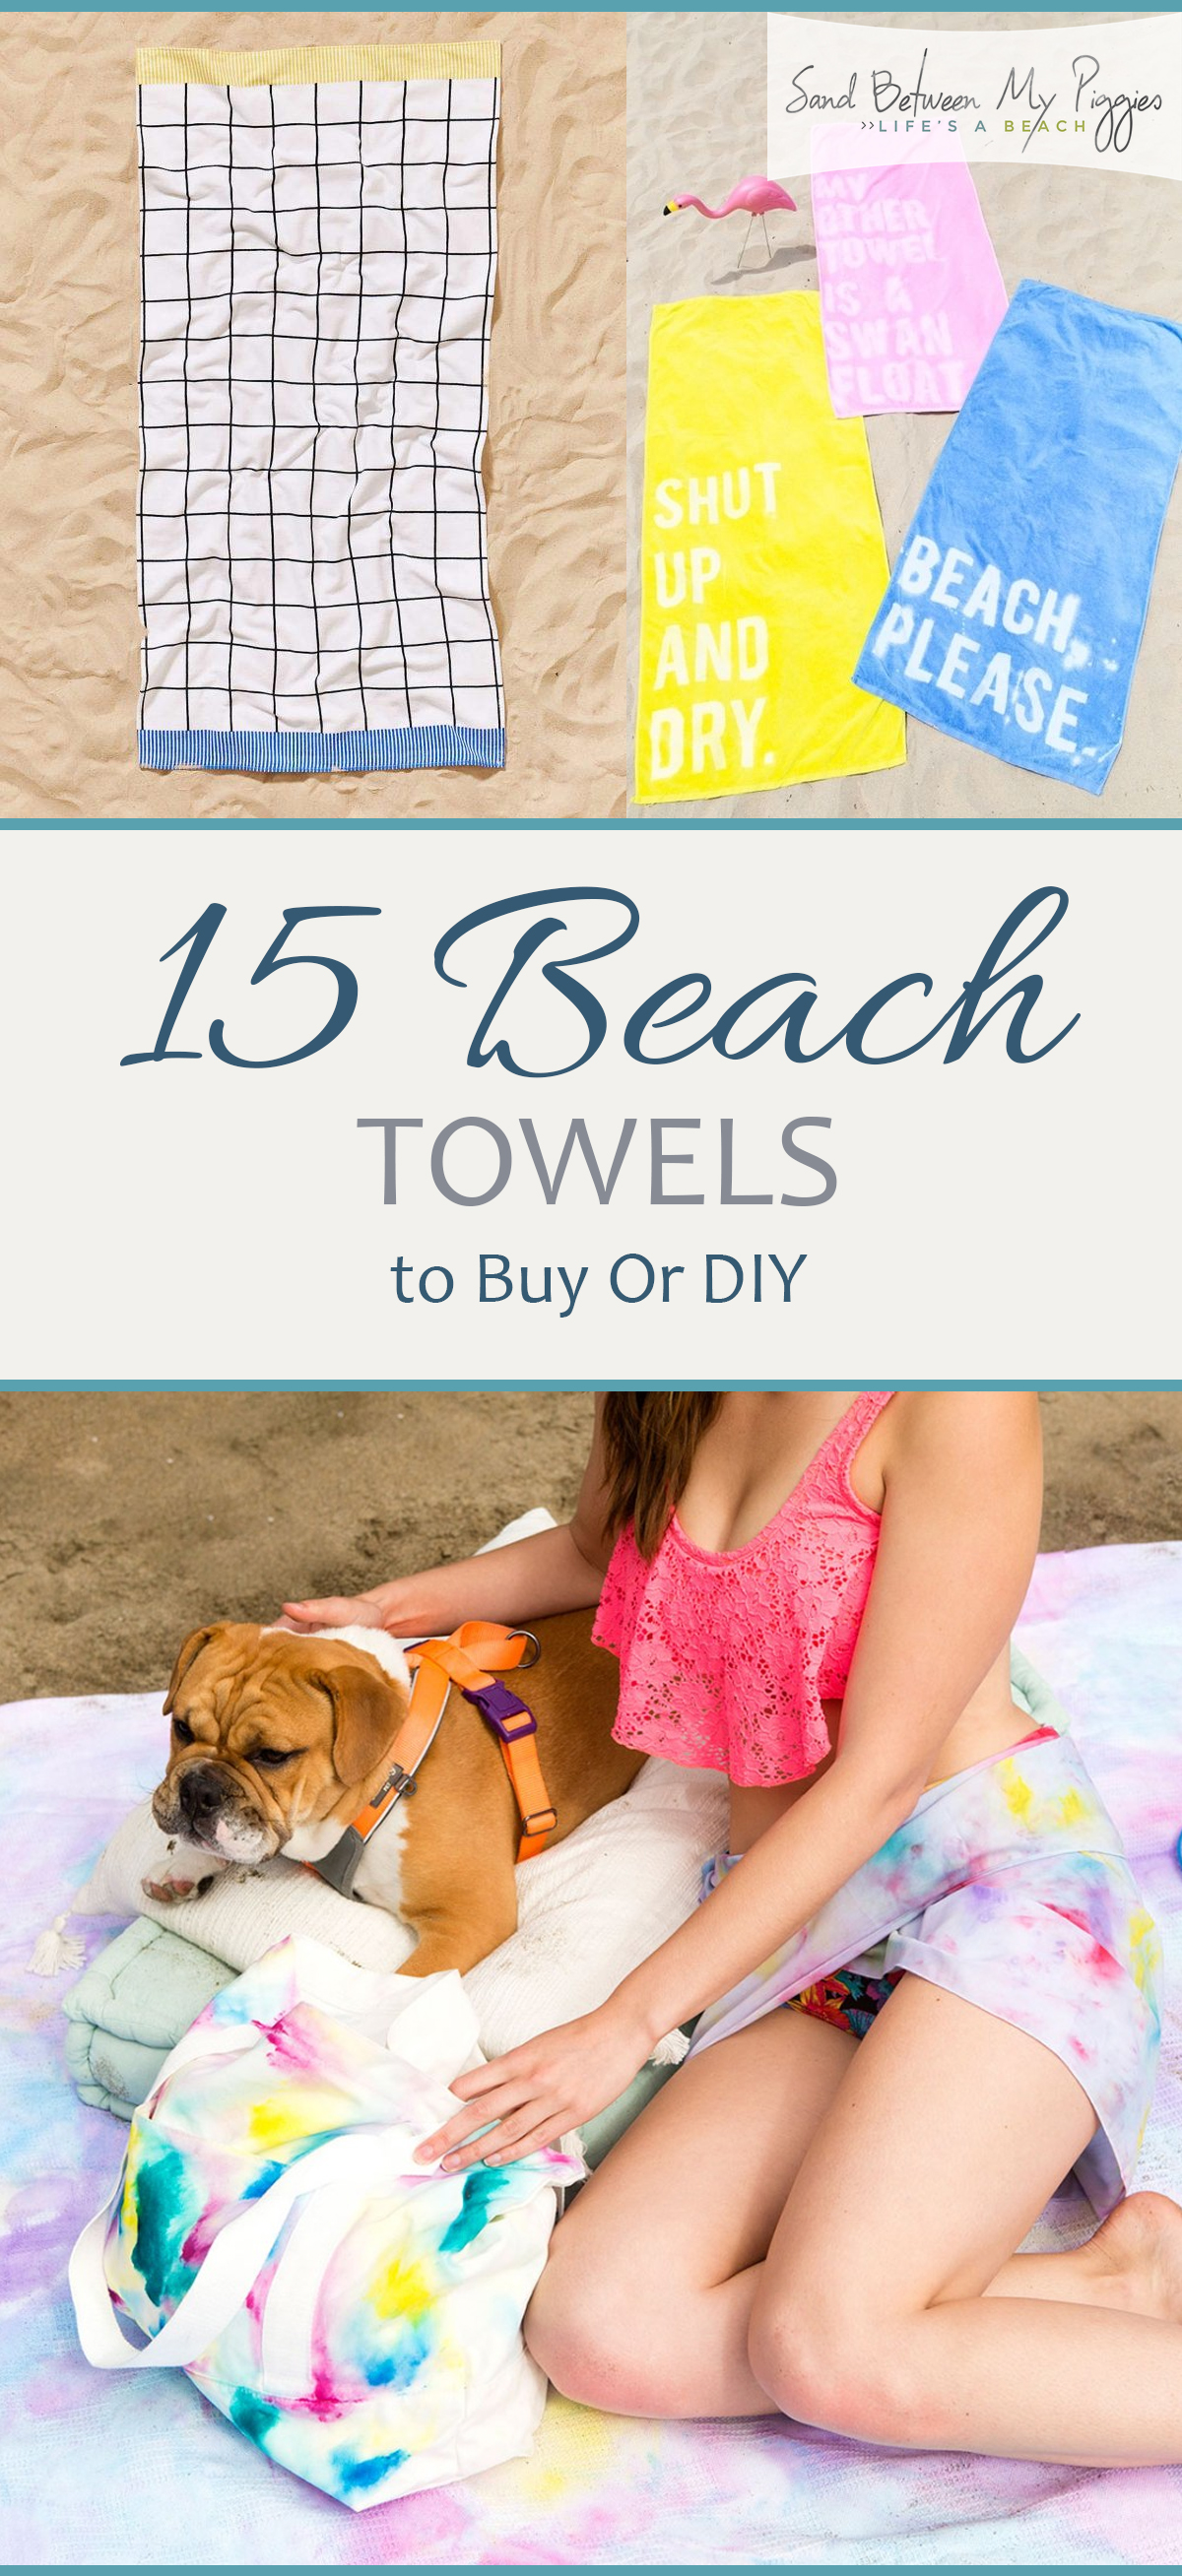 Beach Towels, Homemade Beach Towels, Beach Towels for Less, Beach Hacks, Handmade Beach Towels, Easy DIY Beach Towels, Popular Pin